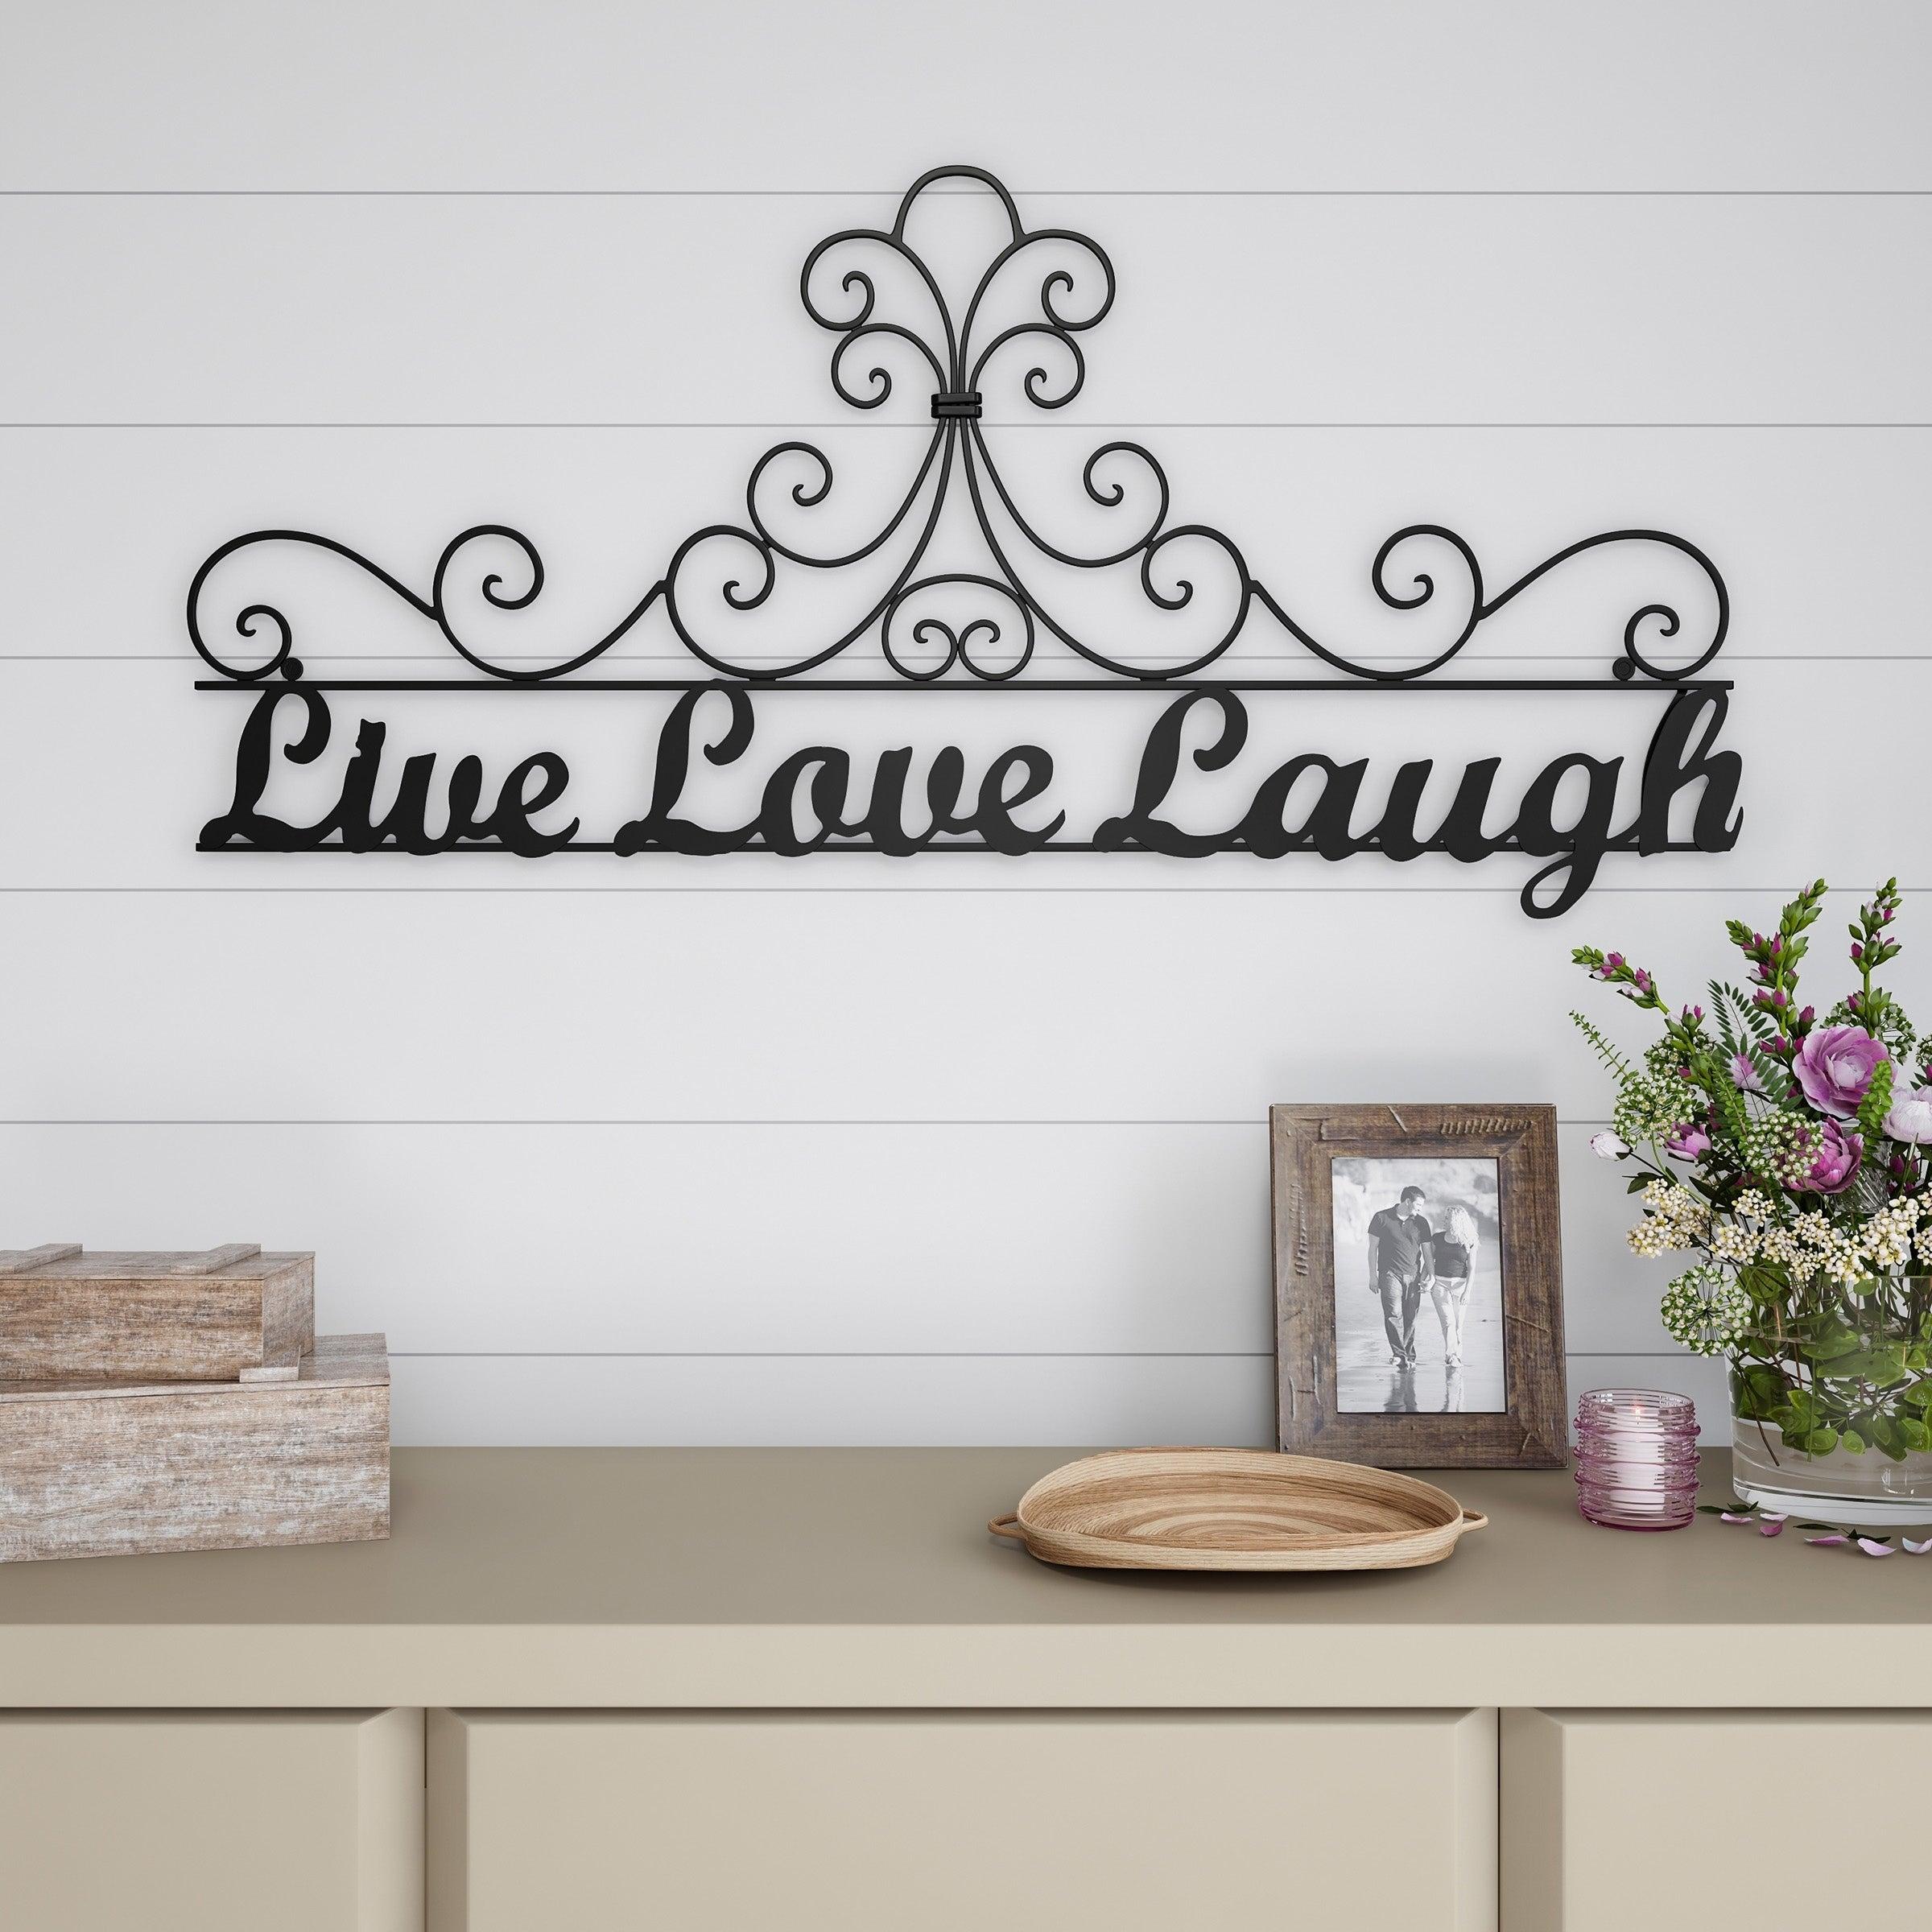 Favorite Live, Laugh, Love Antique Copper Wall Decor Regarding Metal Cutout Live Laugh Love Decorative Wall Sign 3D Word Art Lavish Home (View 12 of 20)